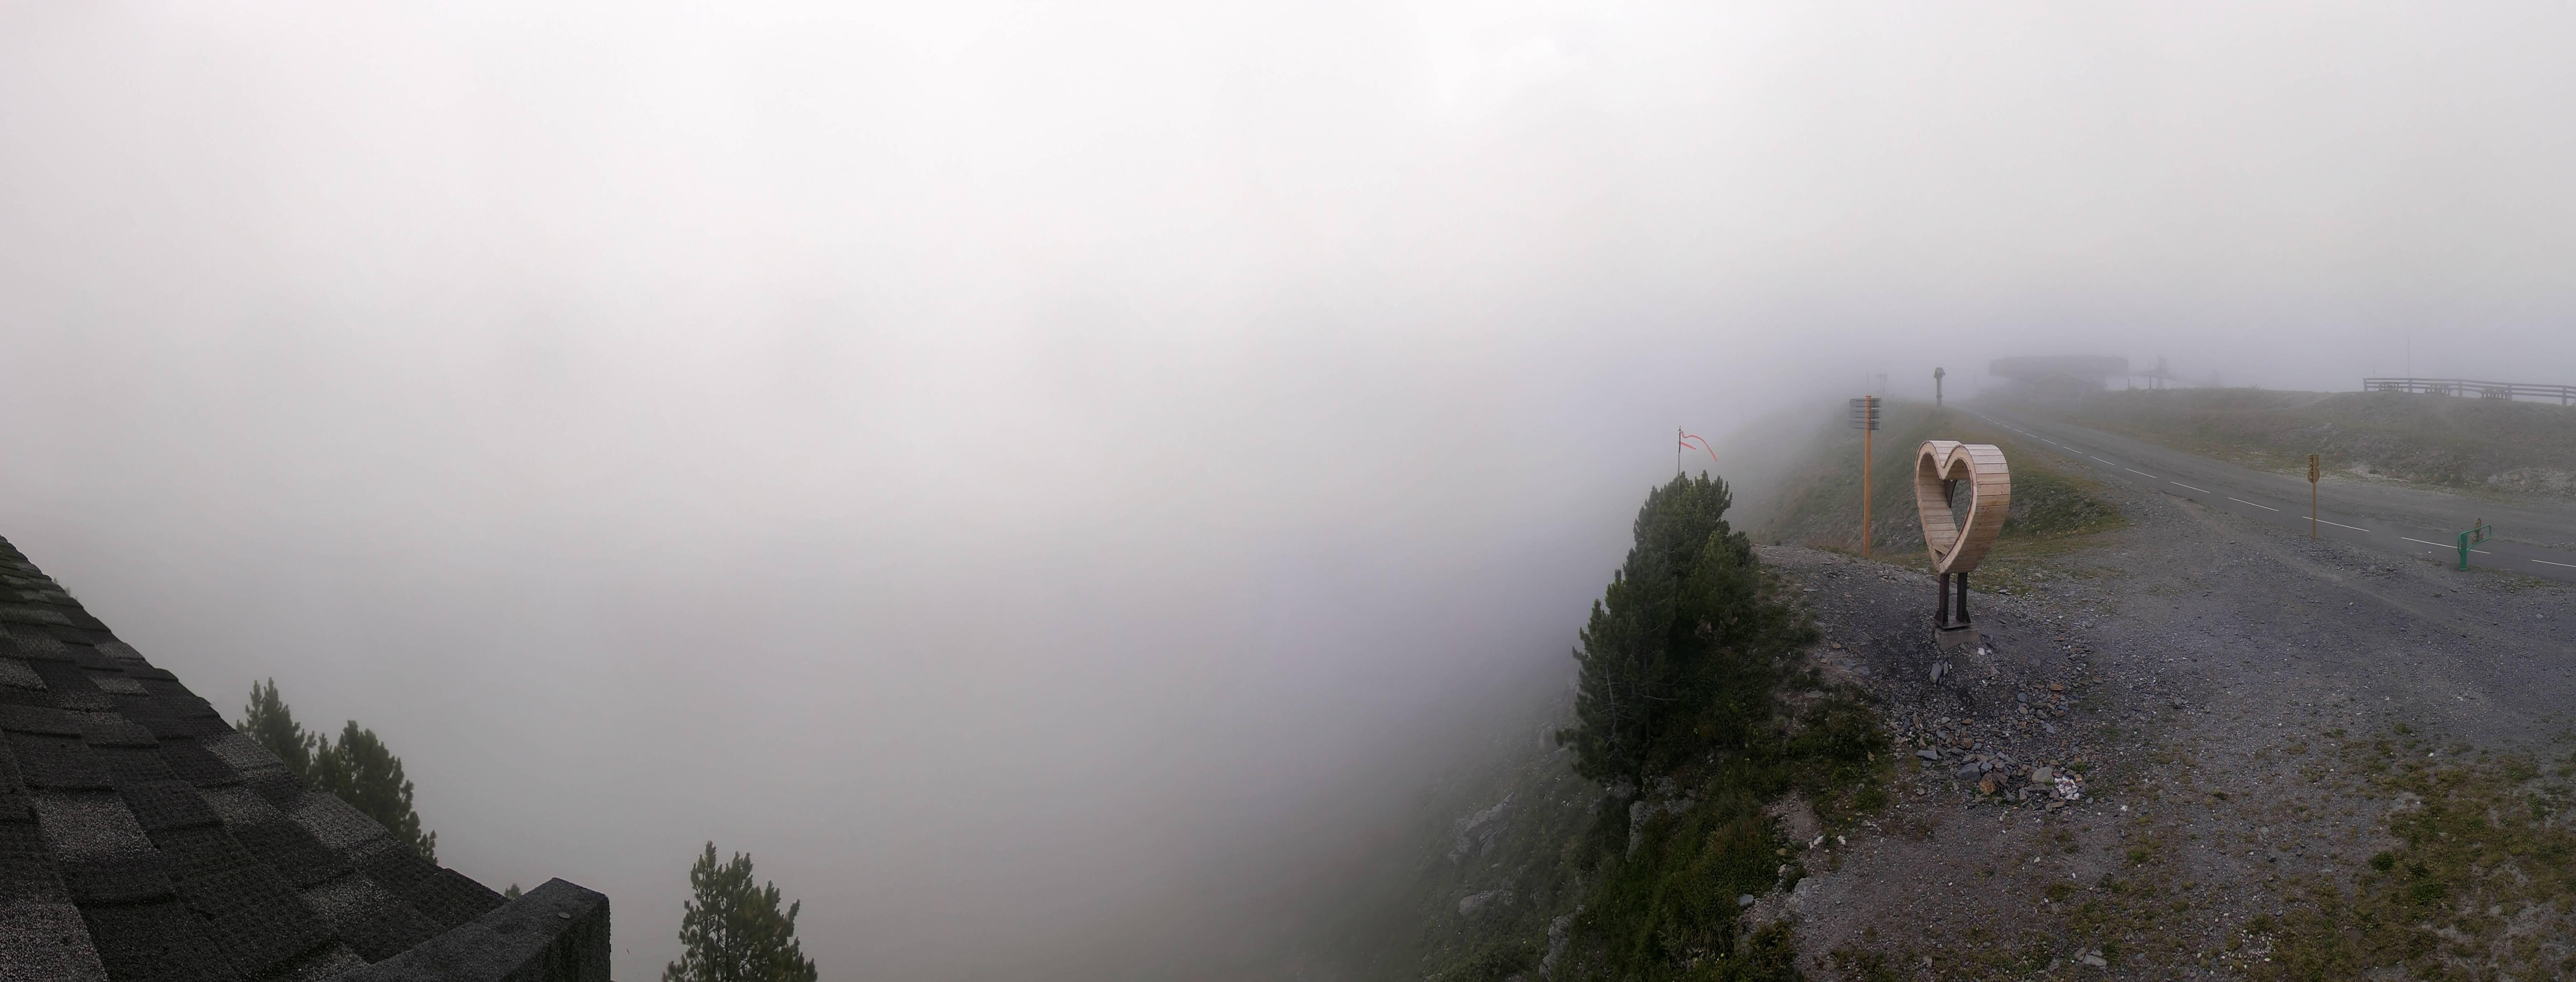 3 Vallees Meribel webcam - Tougnete ski station